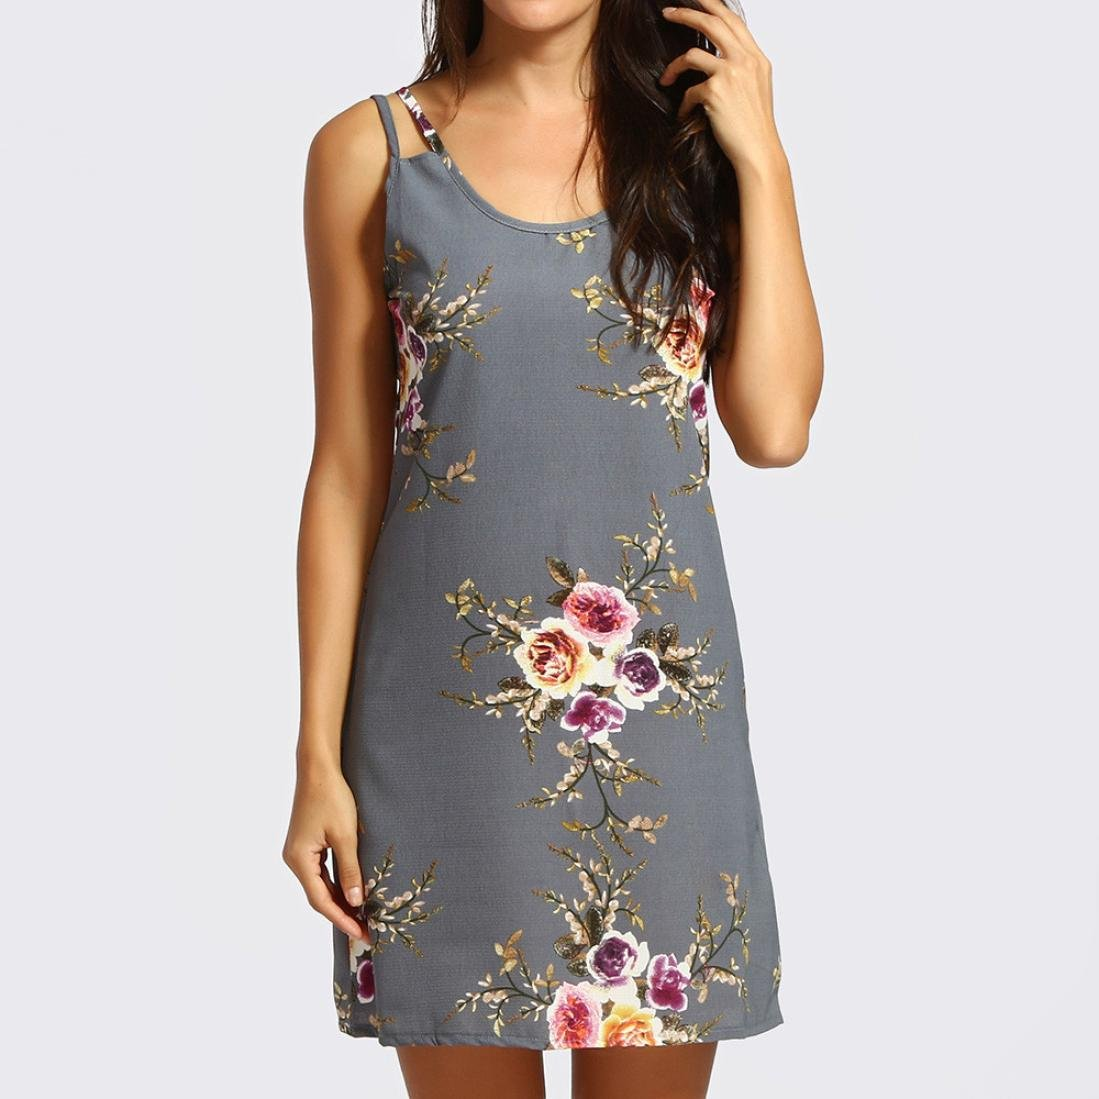 668ad1a07338ce Amphia Damen Kleid Strandkleid Blumen Druckkleid Bandeaukleid Floral  Sommerkleid Spaghettiträger Kleid: Amazon.de: Bekleidung